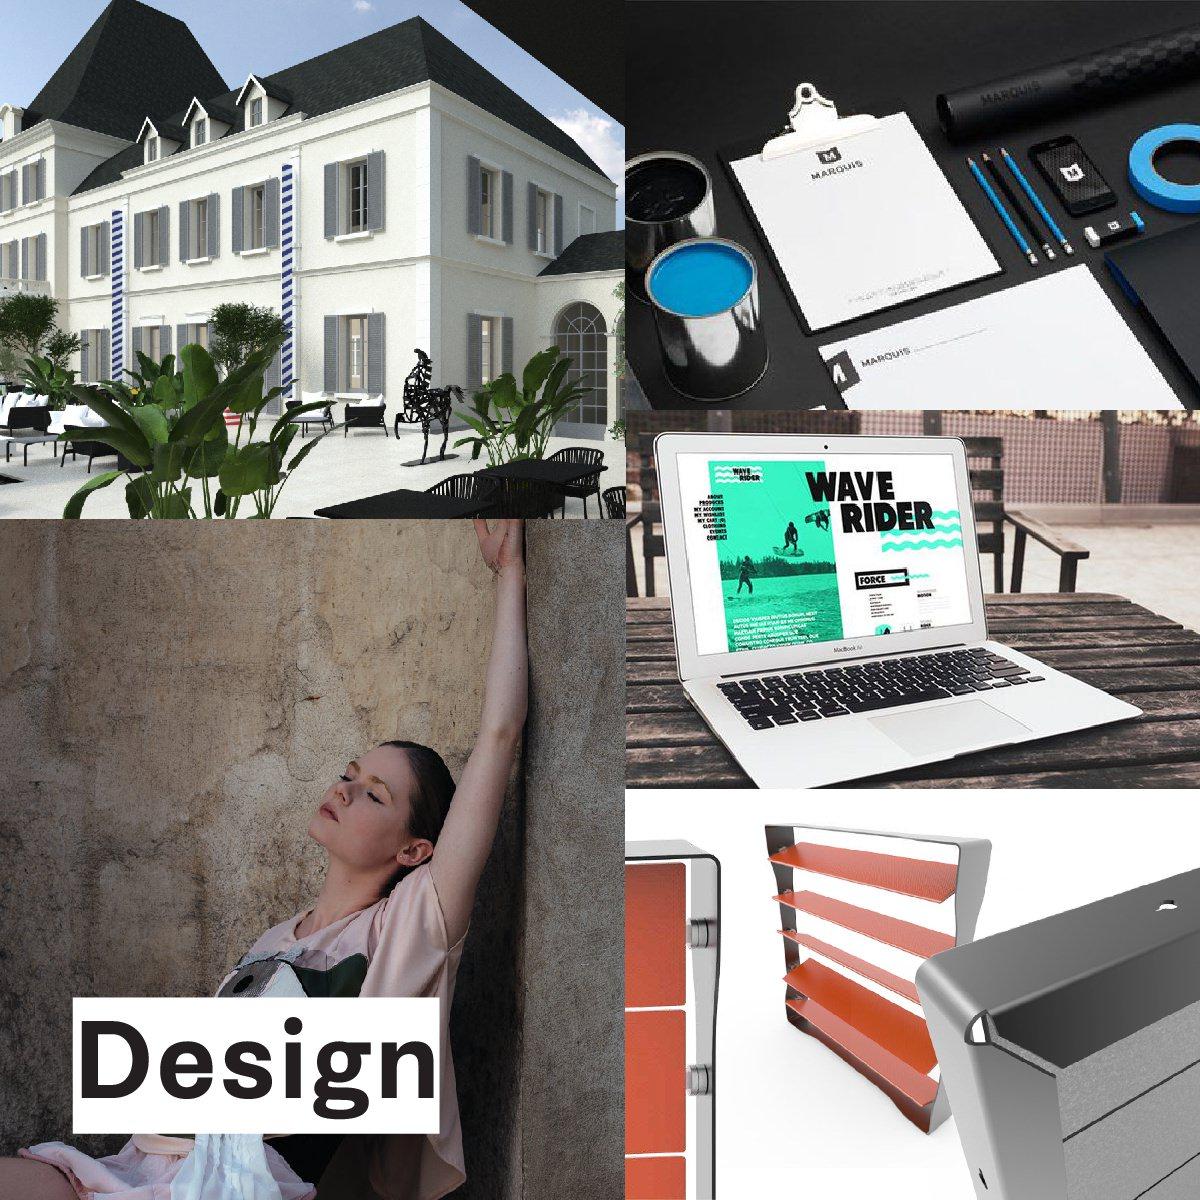 Bellecour Ecole - Design